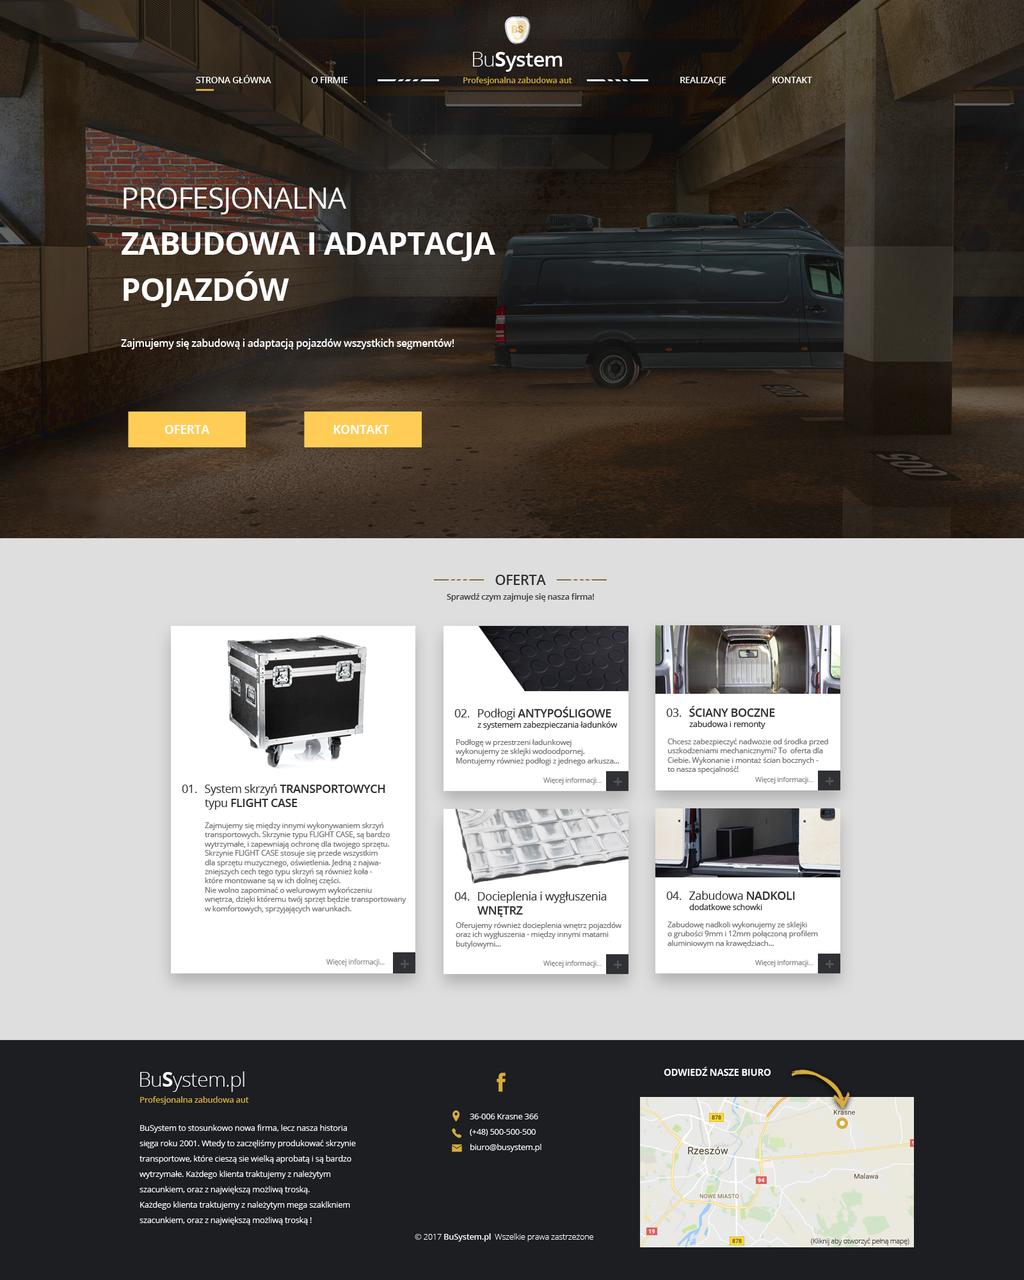 Busystem.pl - cars adaptation by miguslaw